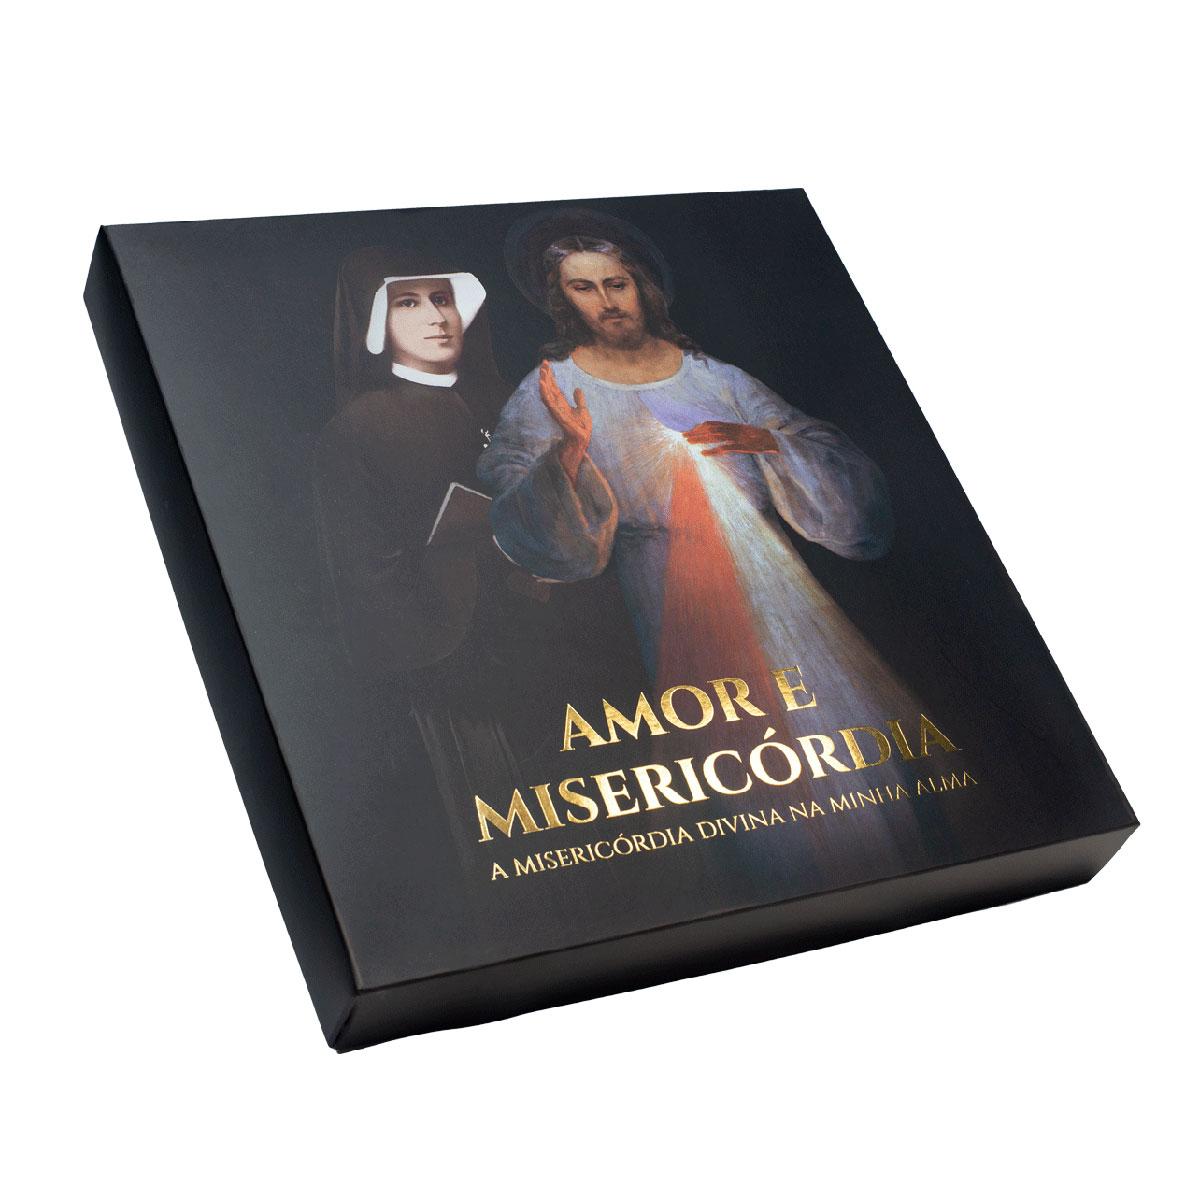 Amor e Misericordia - A Misericordia Divina na Minha Alma - BOX  - VindVedShop - Distribuidora Catolica